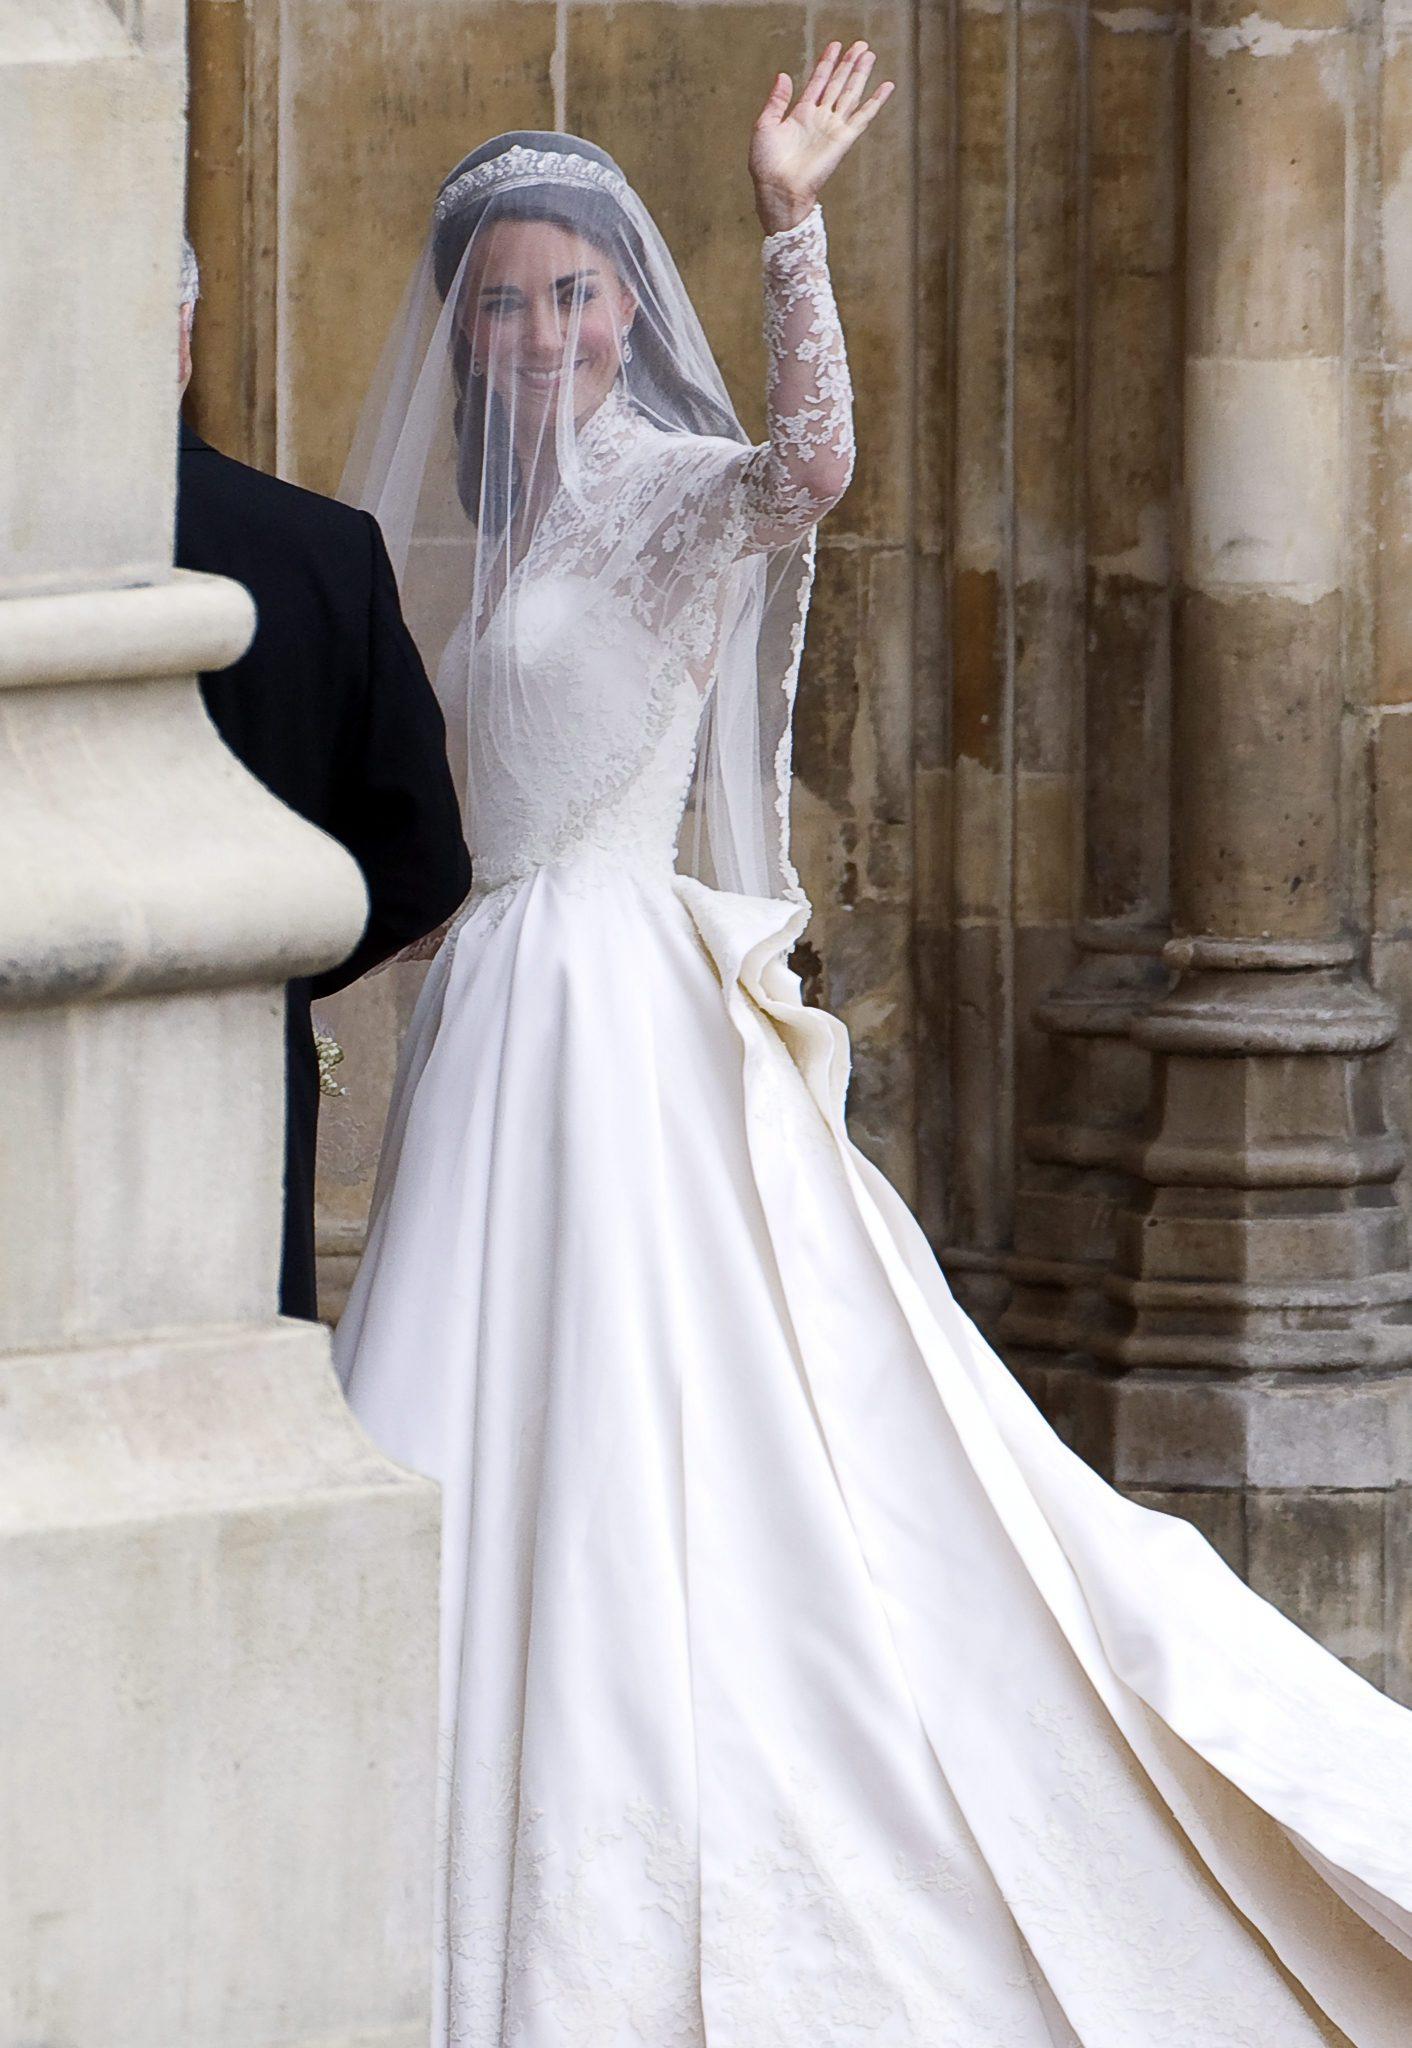 Princess Catherine in Sarah Burton wedding dress ...